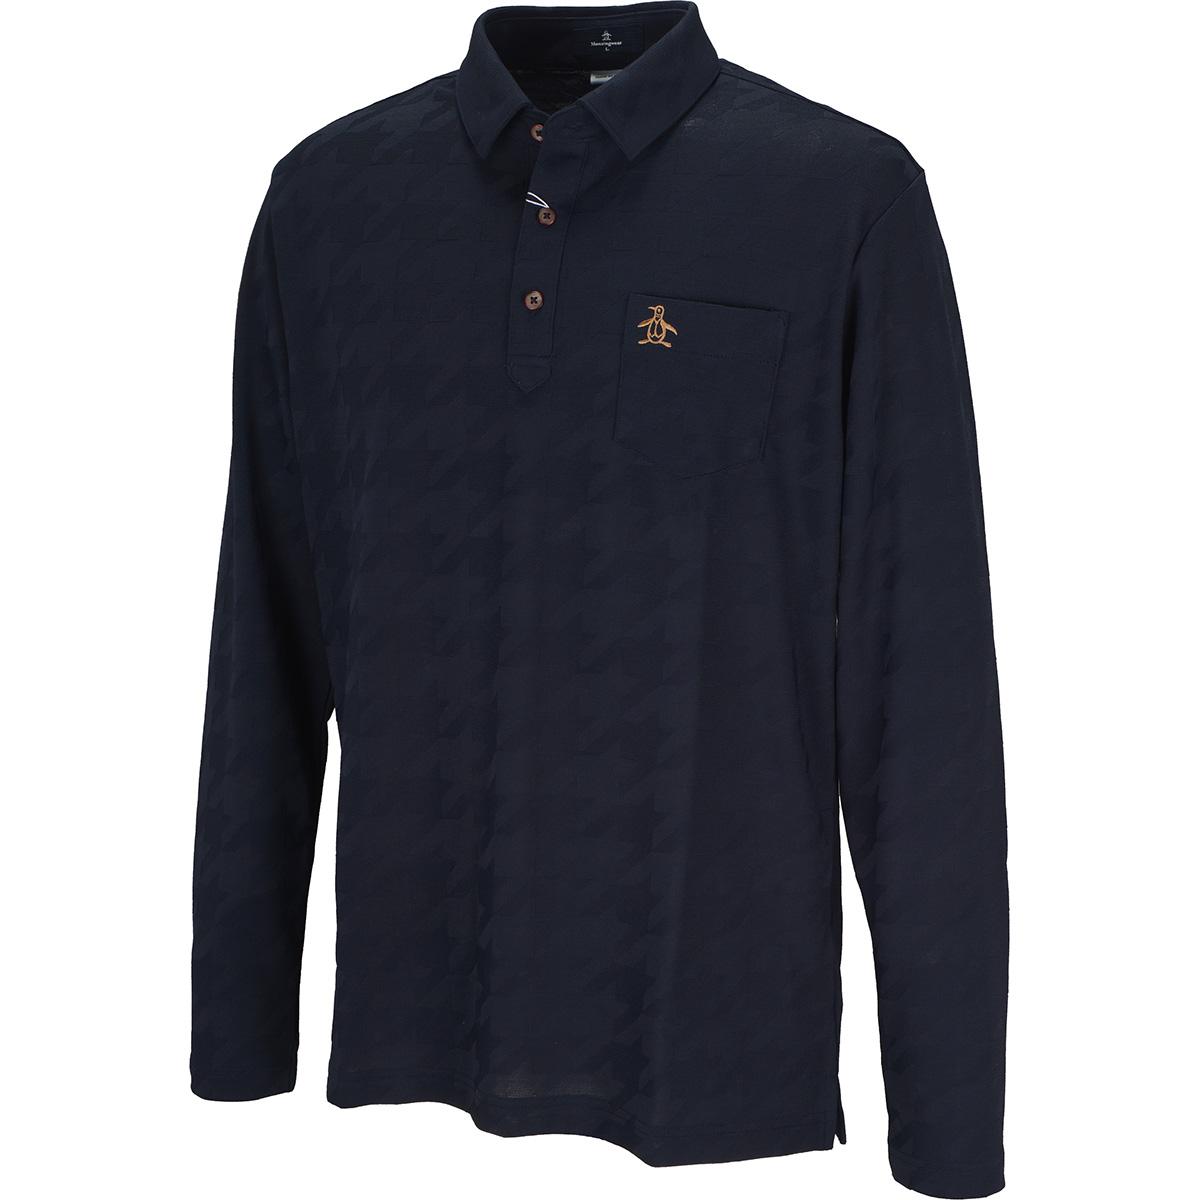 ONE THING フィラシス リンクスジャカード長袖ポロシャツ